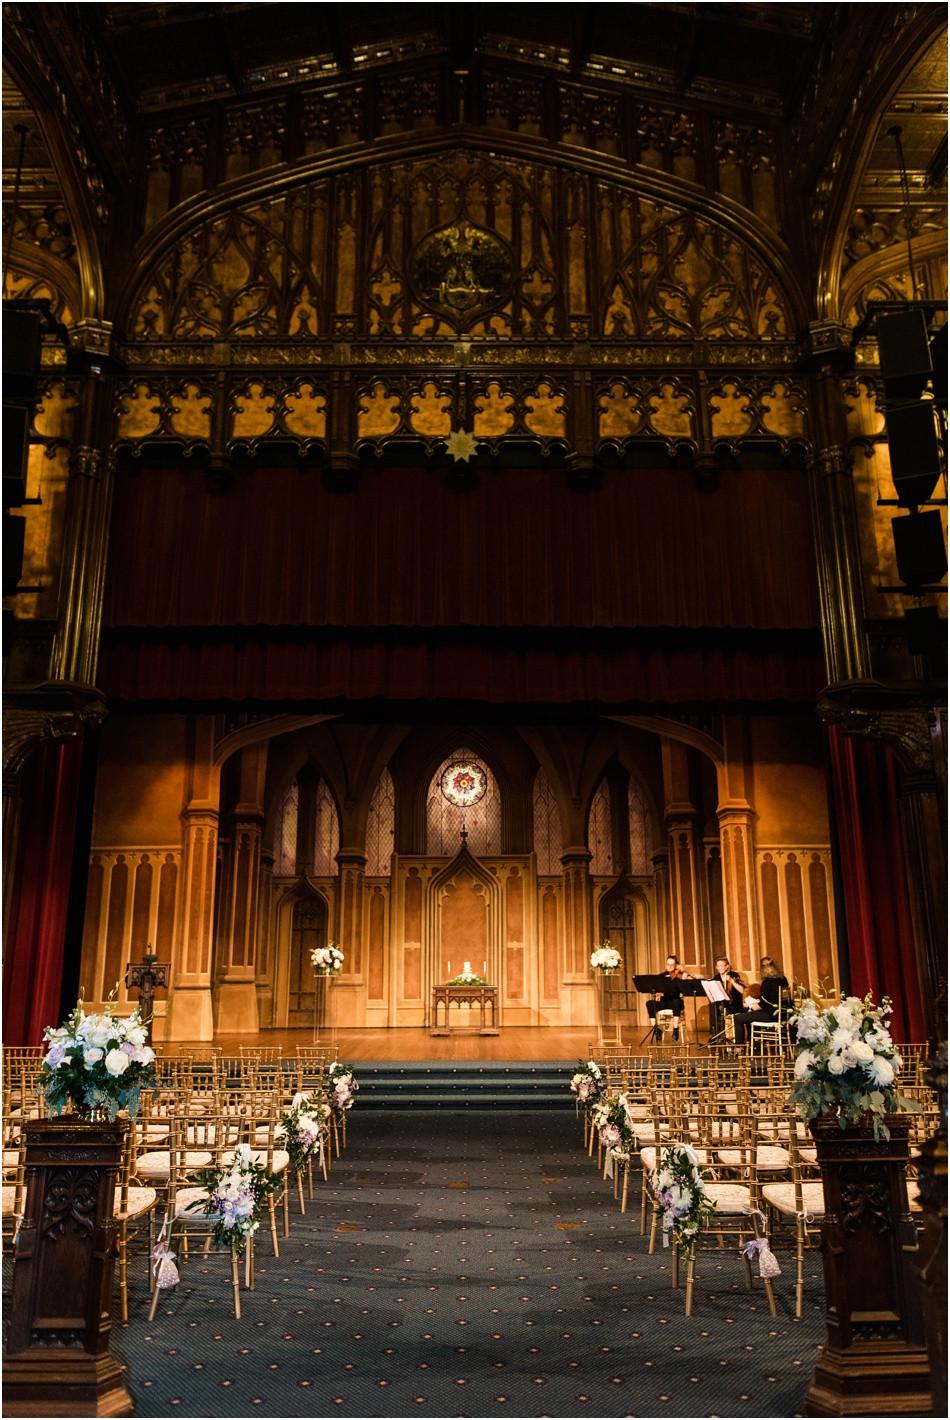 Theatre-room-sottish-rite-events